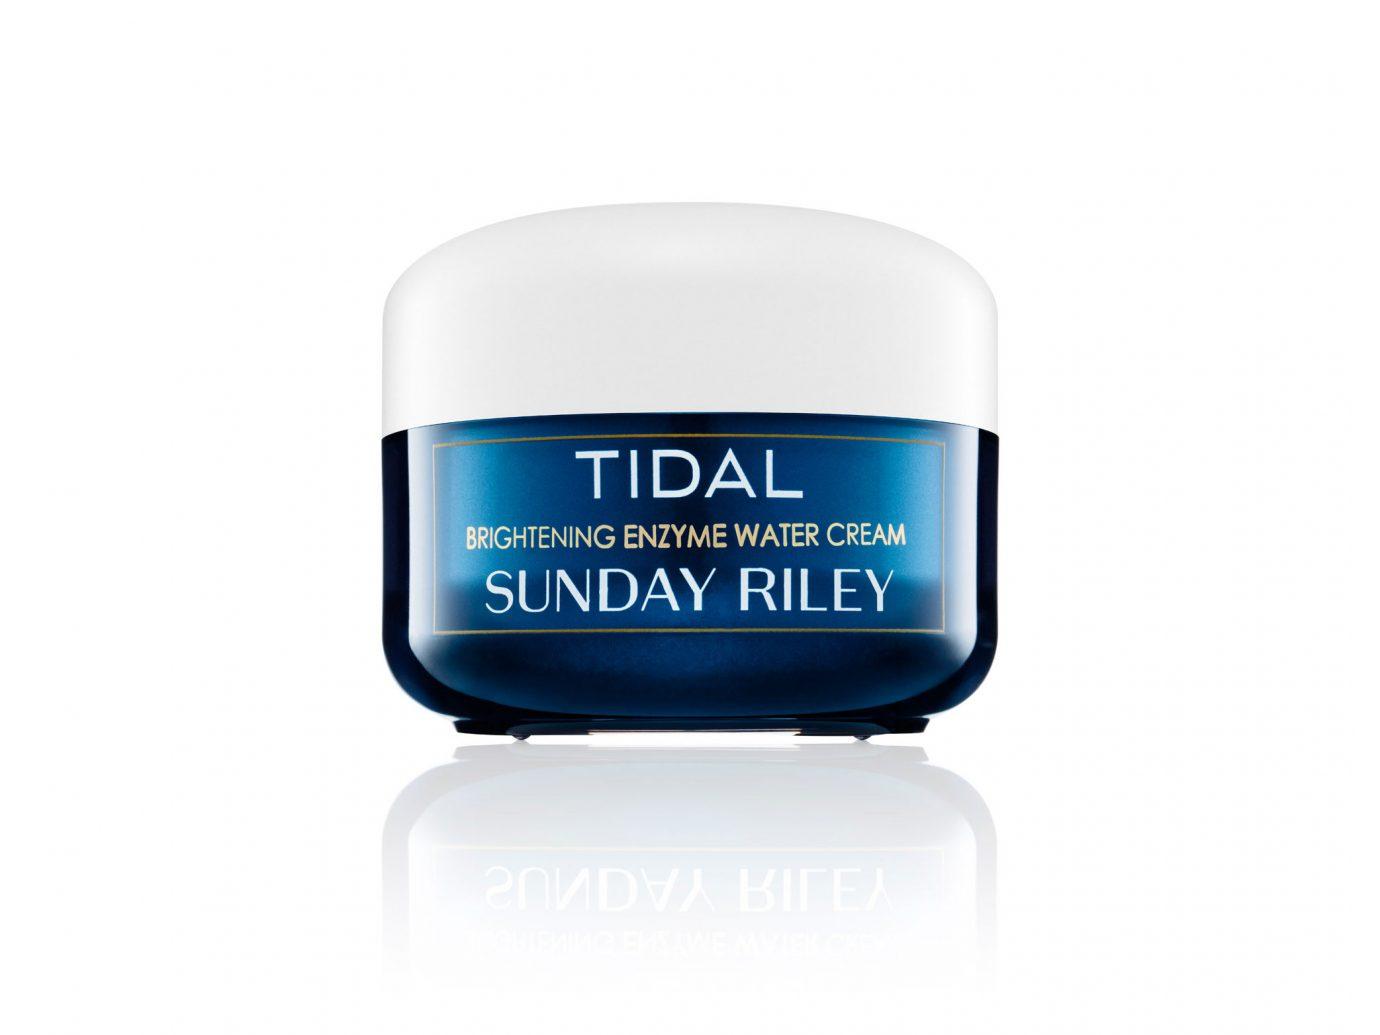 Sunday Riley Tidal Brightening Enzyme Water Cream (0.5 oz)